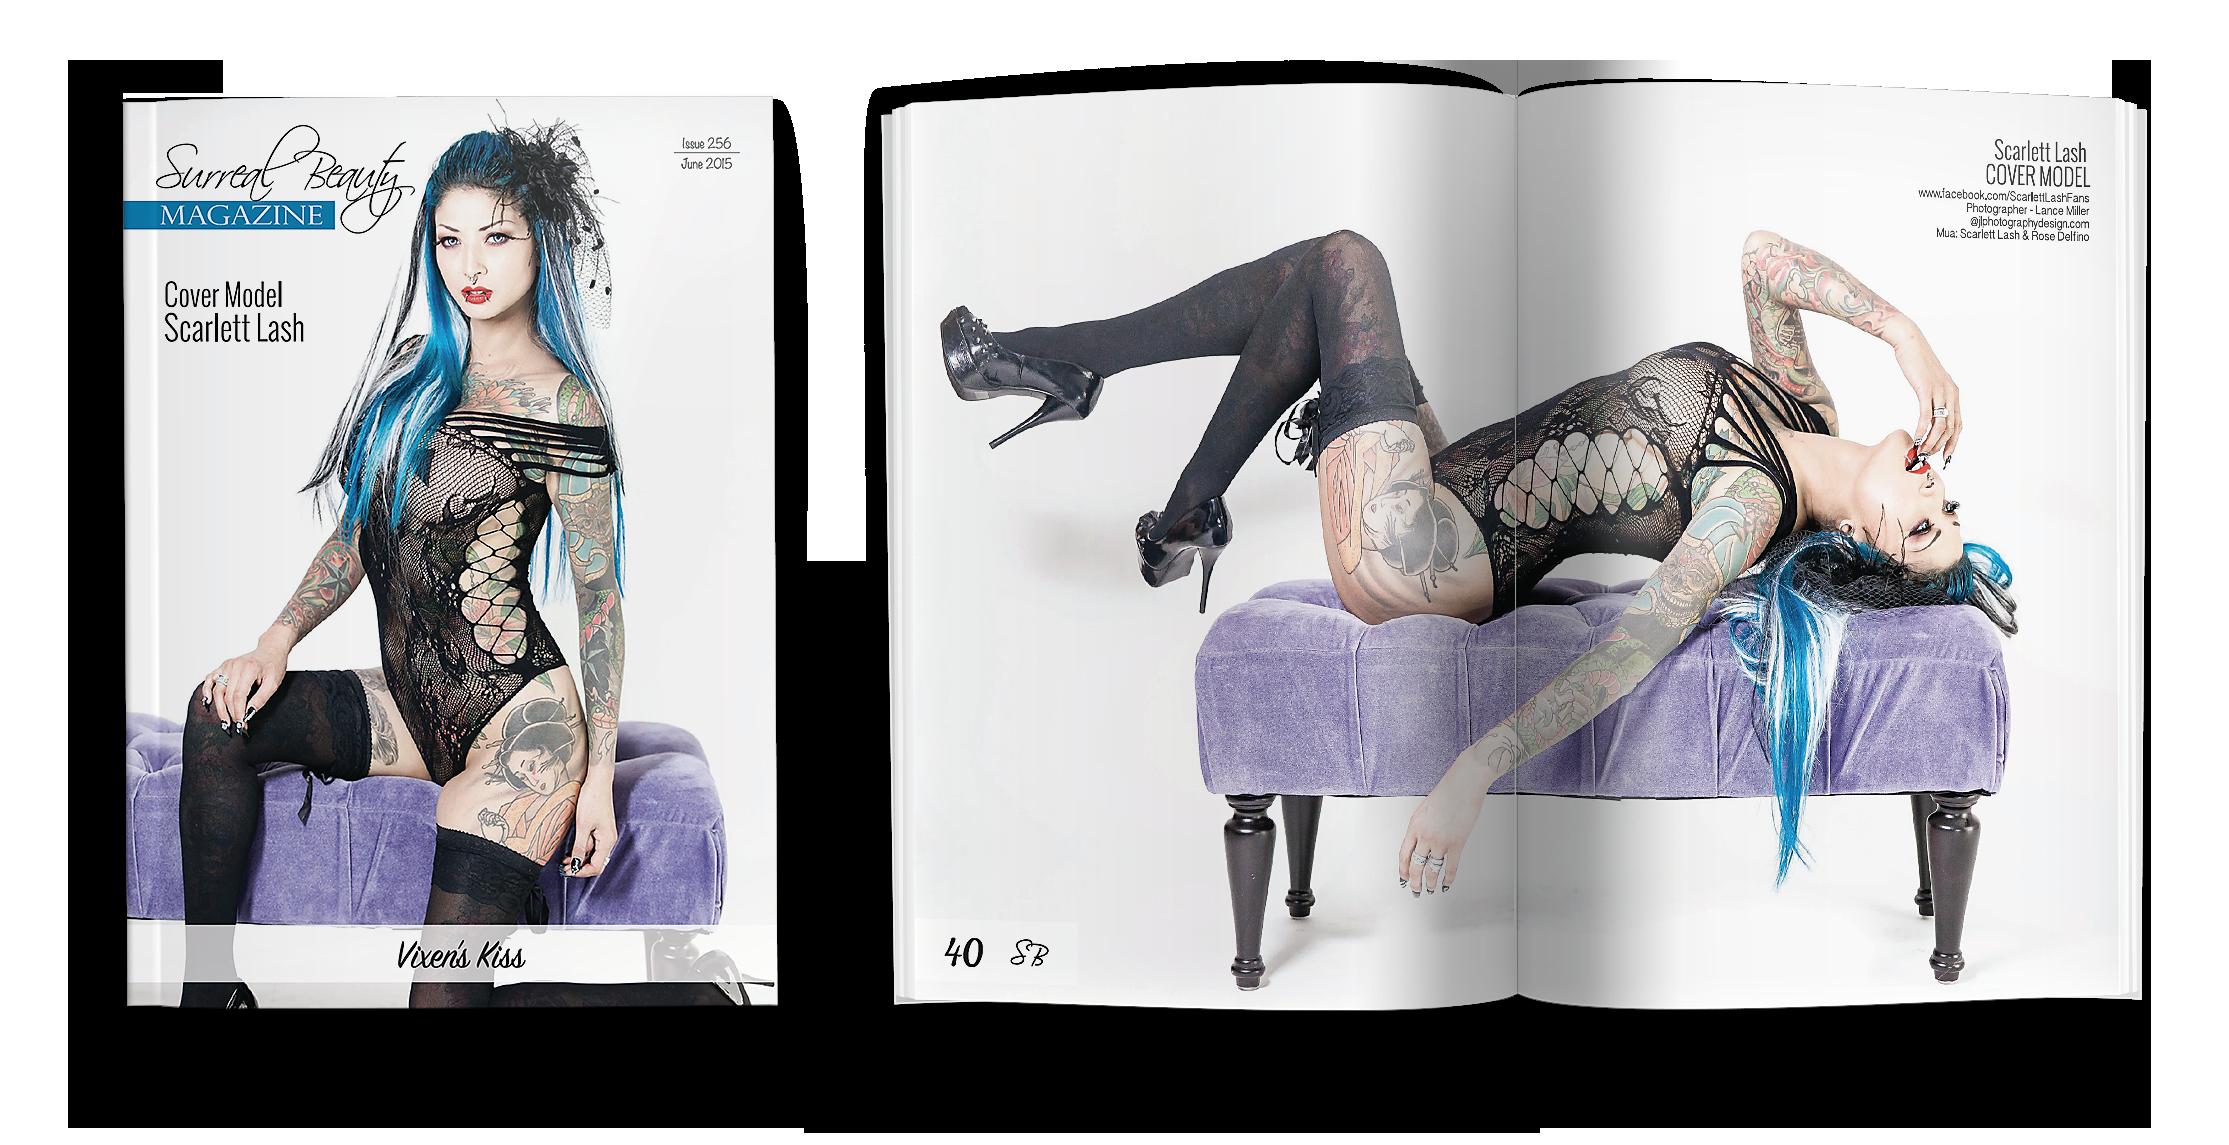 Surreal_Beauty_Magazine_Vixen_s_Kiss_Render6.png